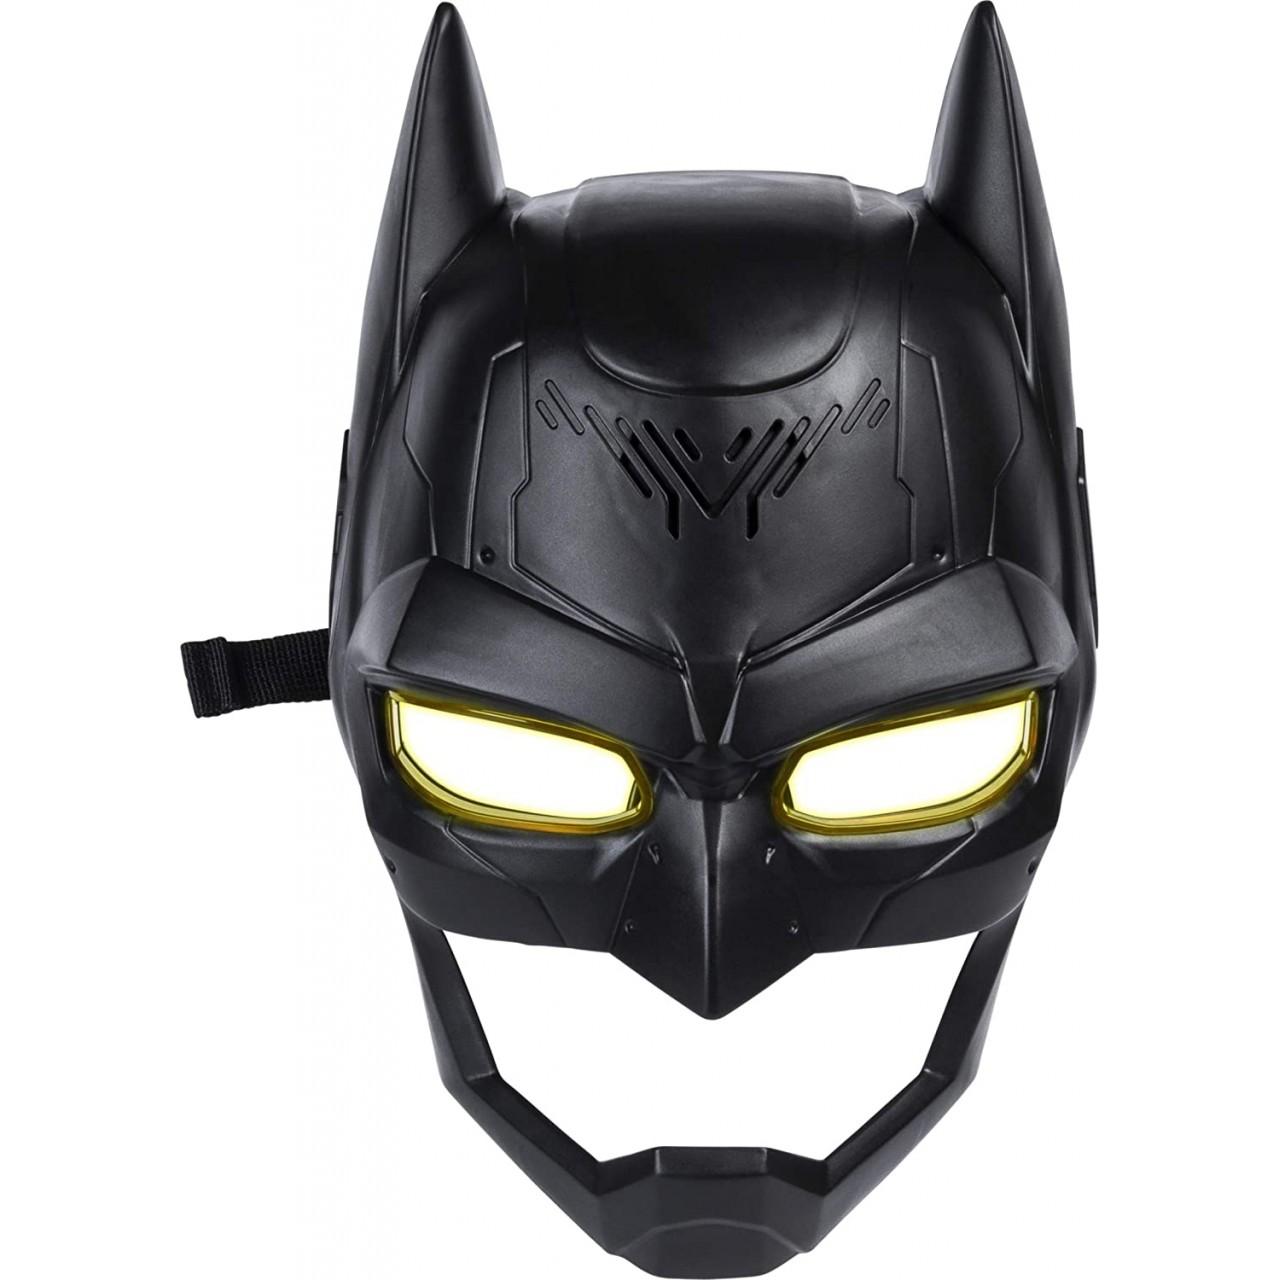 Інтерактивна маска Бетмана змінює голос BATMAN Voice Changing Mask 6055296